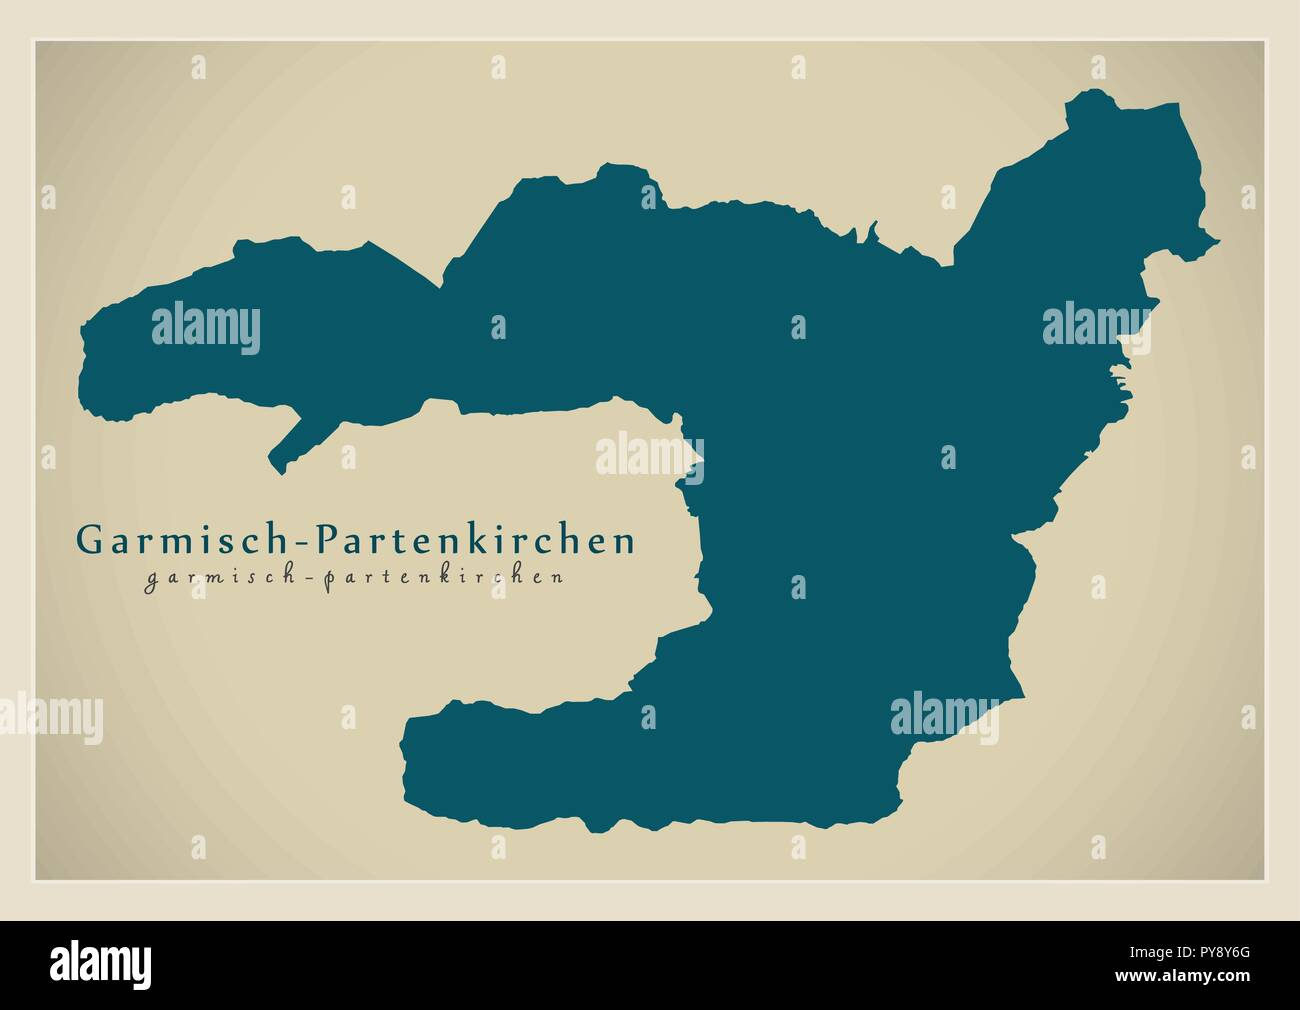 Map Of Germany Garmisch.Garmisch Partenkirchen Administration Area Map Germany Stock Vector